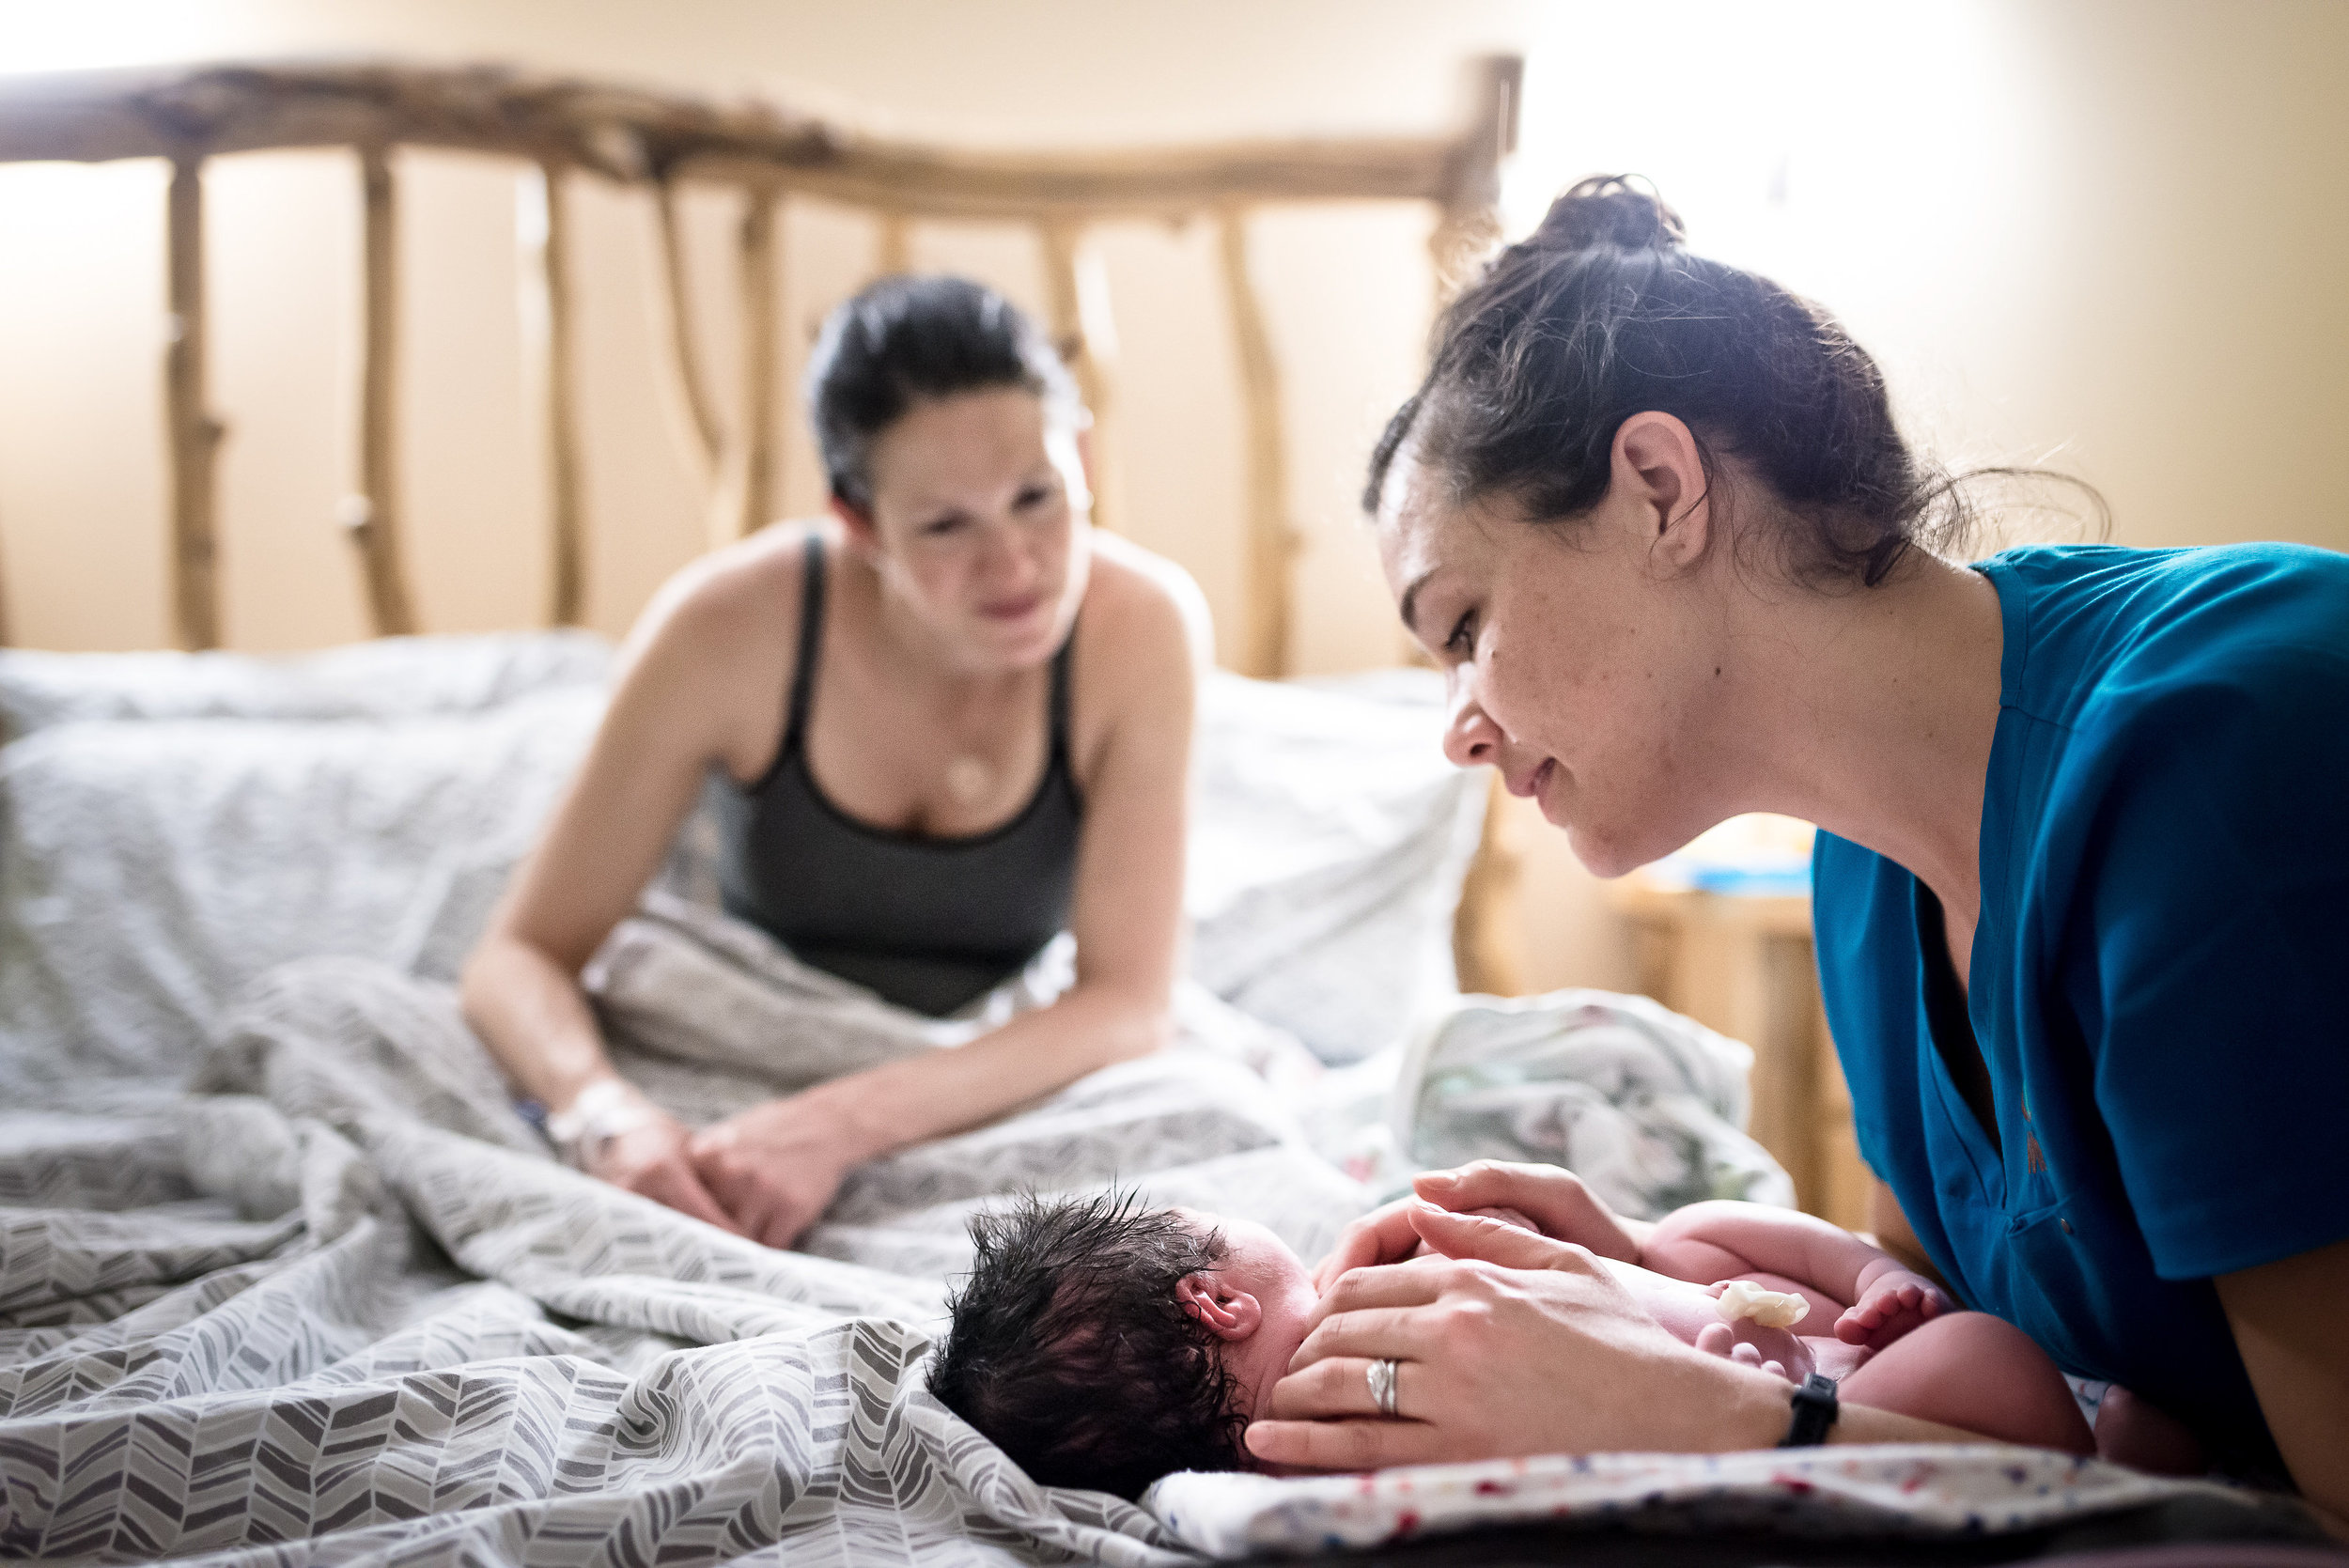 newborn-exam-mountain-midwifery-center